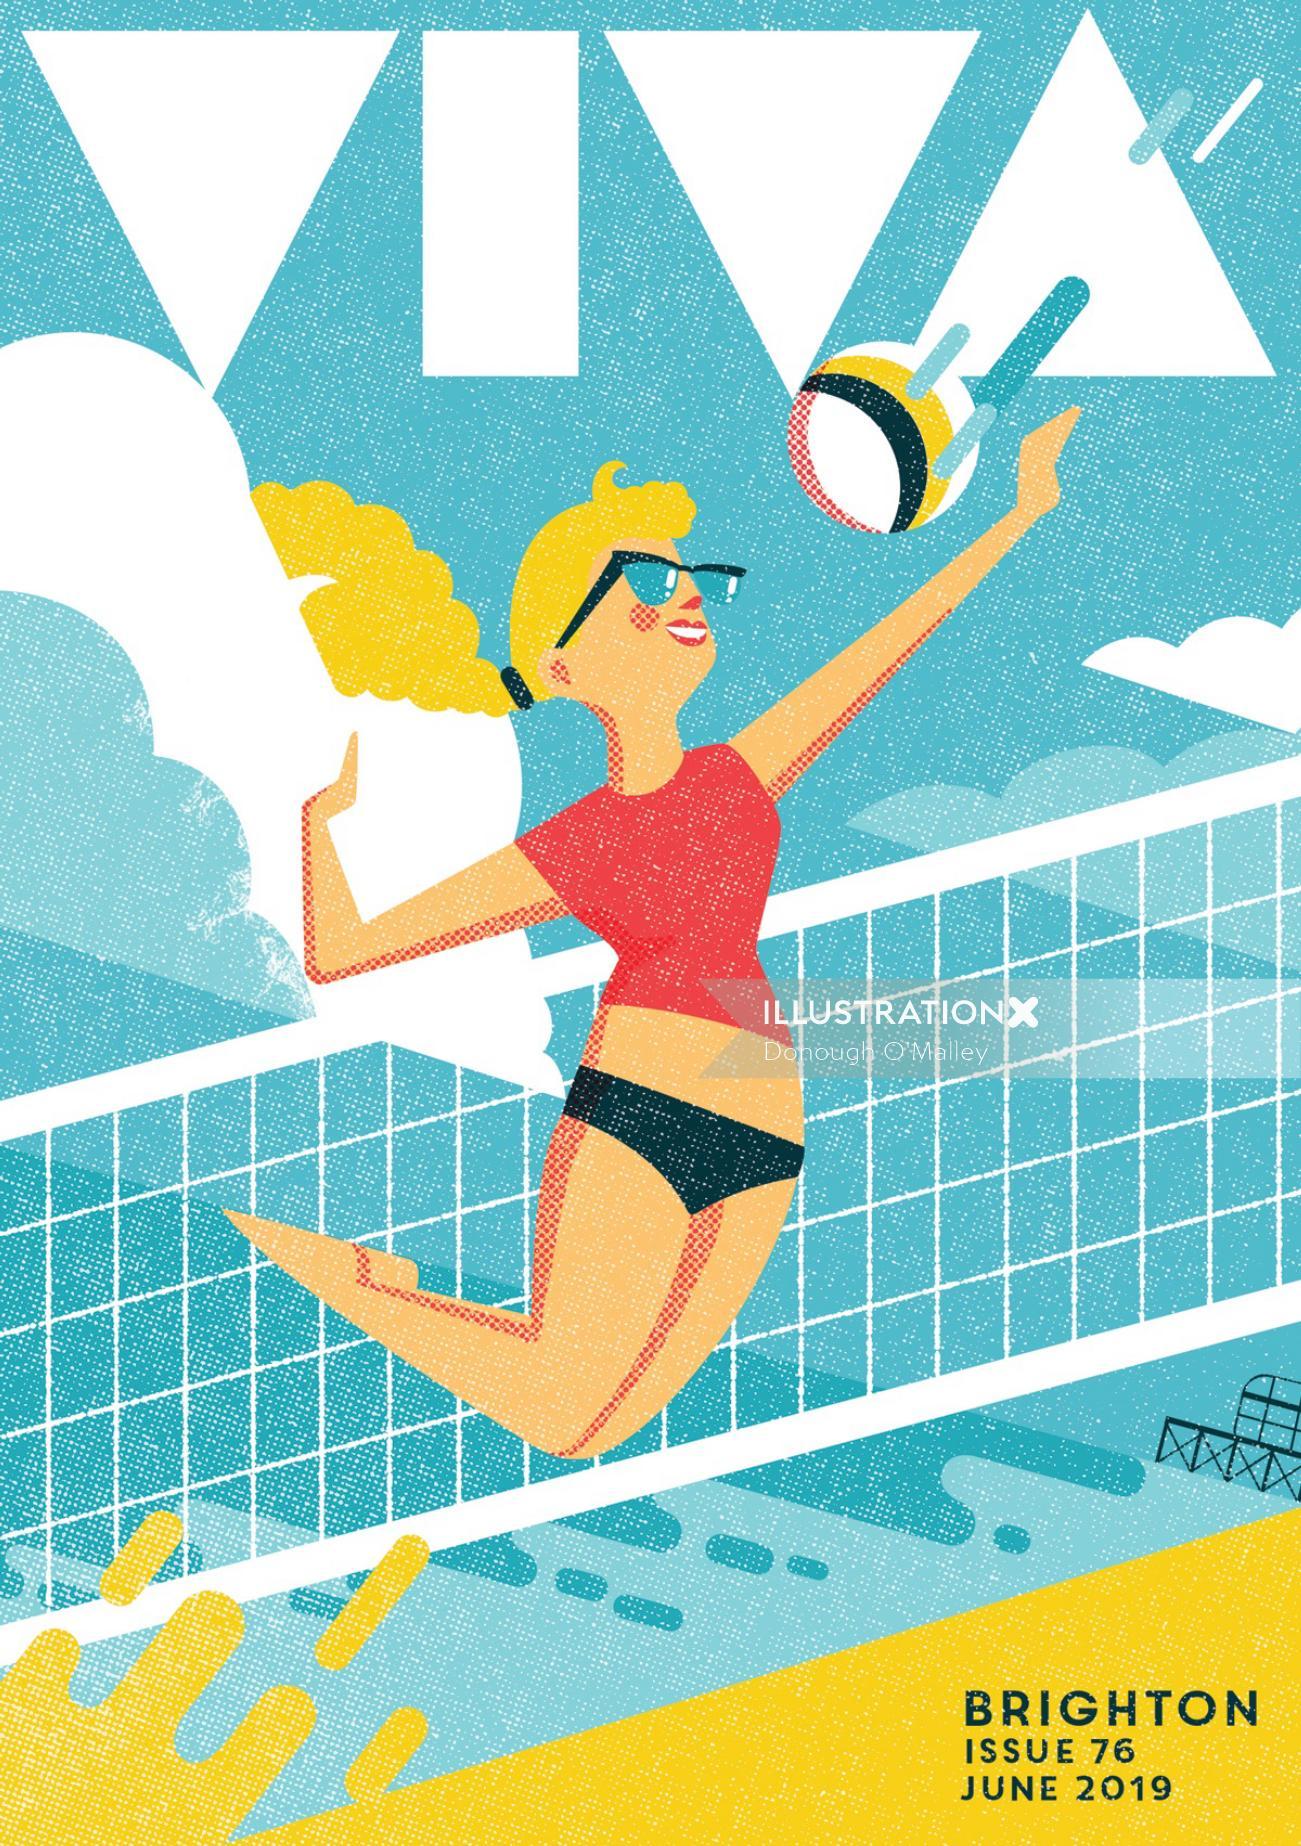 Cover illustration for Viva Brighton magazine